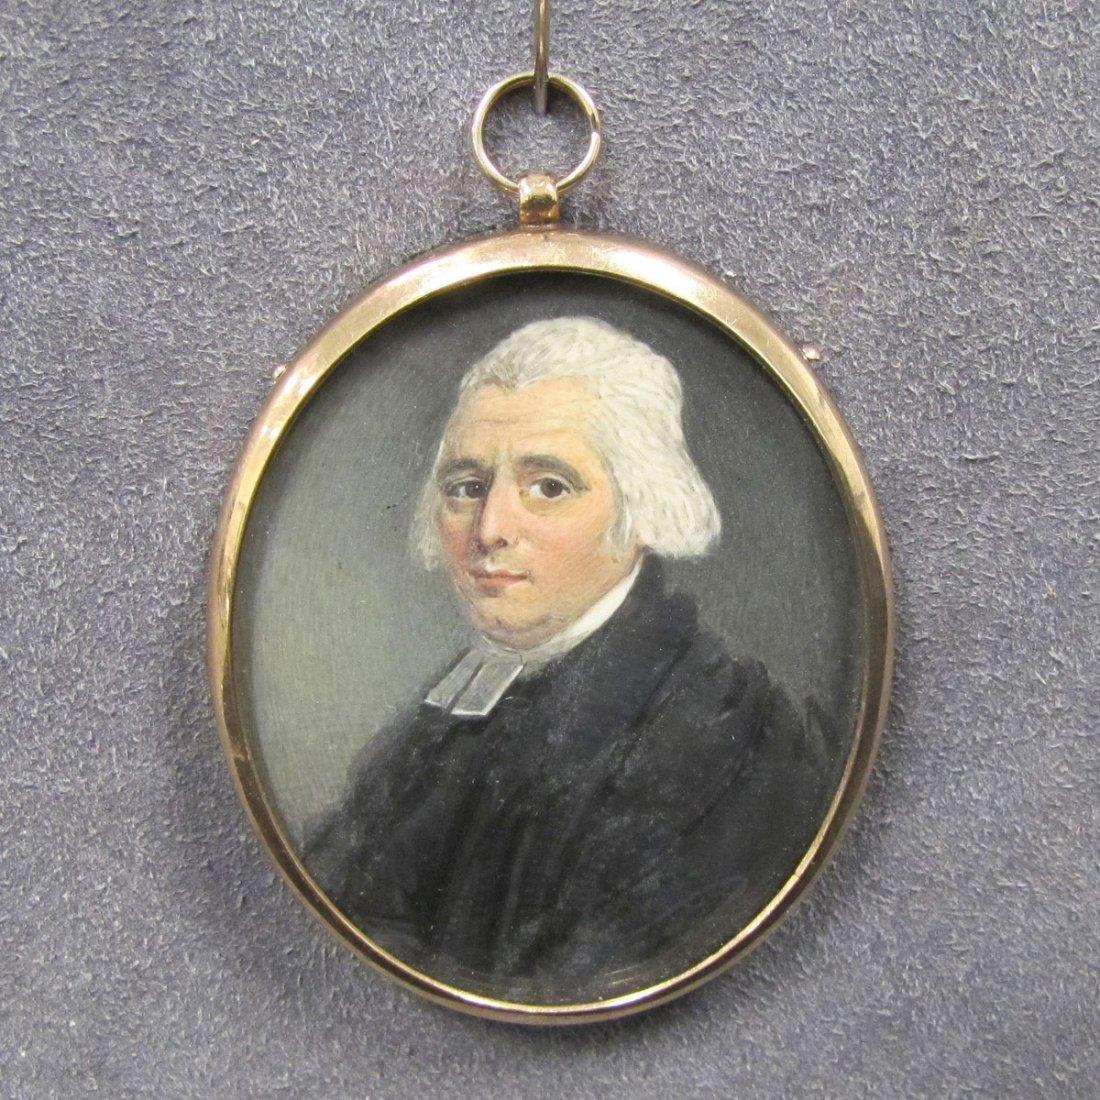 J. NAISH (BRITISH 19TH CENTURY) PORTRAIT MINIATURE